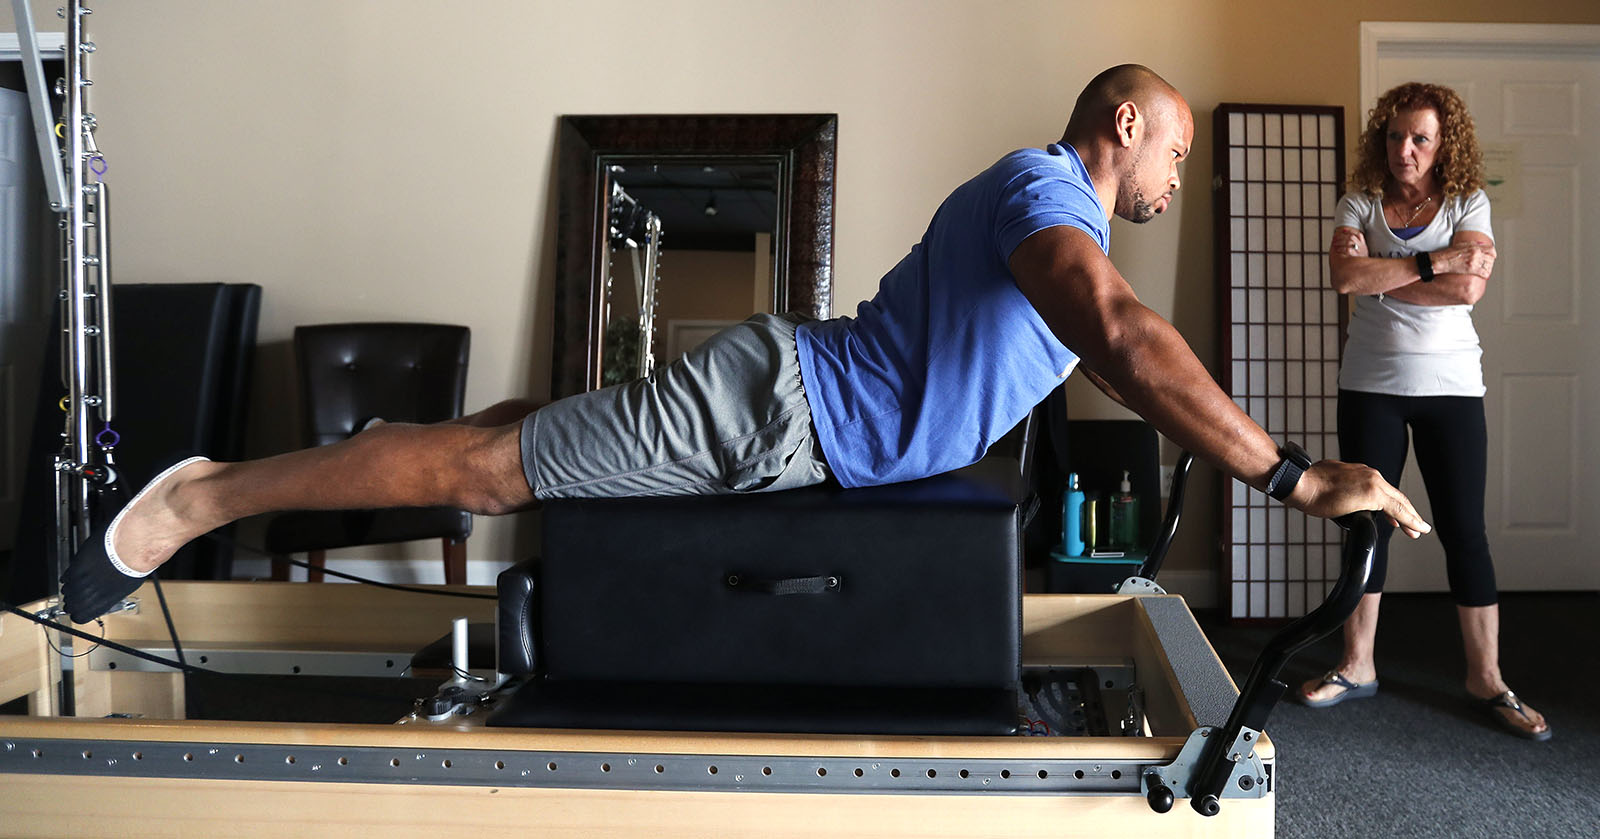 Buffalo Bills LB Lorenzo Alexander has a pilates session with Judi Donner at Symmetry Pilates Studio in Orchard Park. (Mark Mulville/Buffalo News)